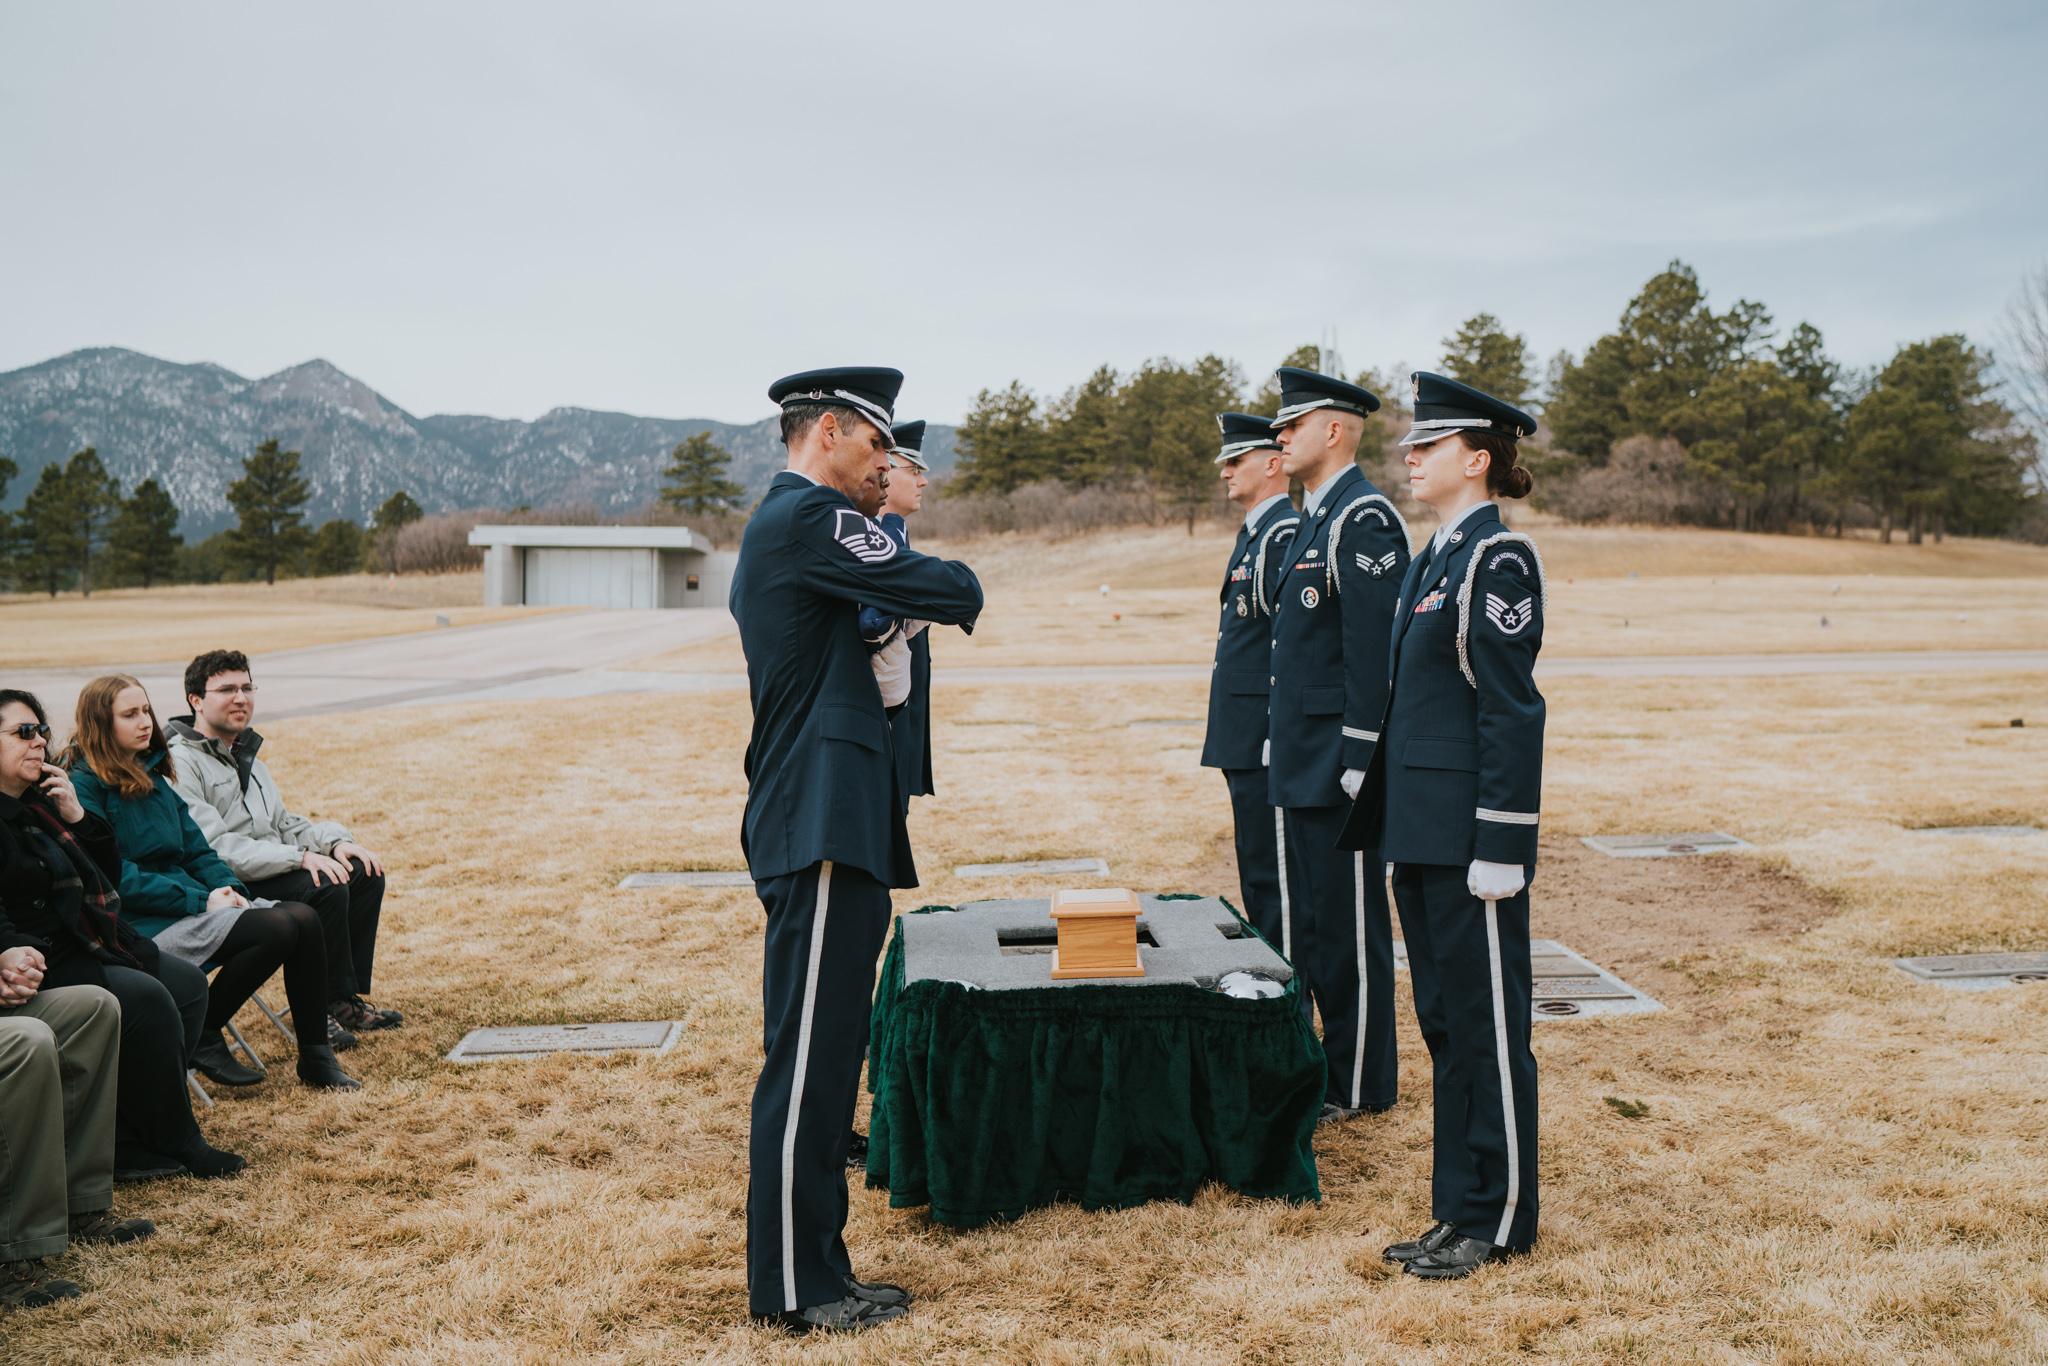 usafa-colorado-military-honours-burial-funeral-photography-grace-elizabeth-colchester-essex-alternative-wedding-lifestyle-photographer (31 of 127).jpg